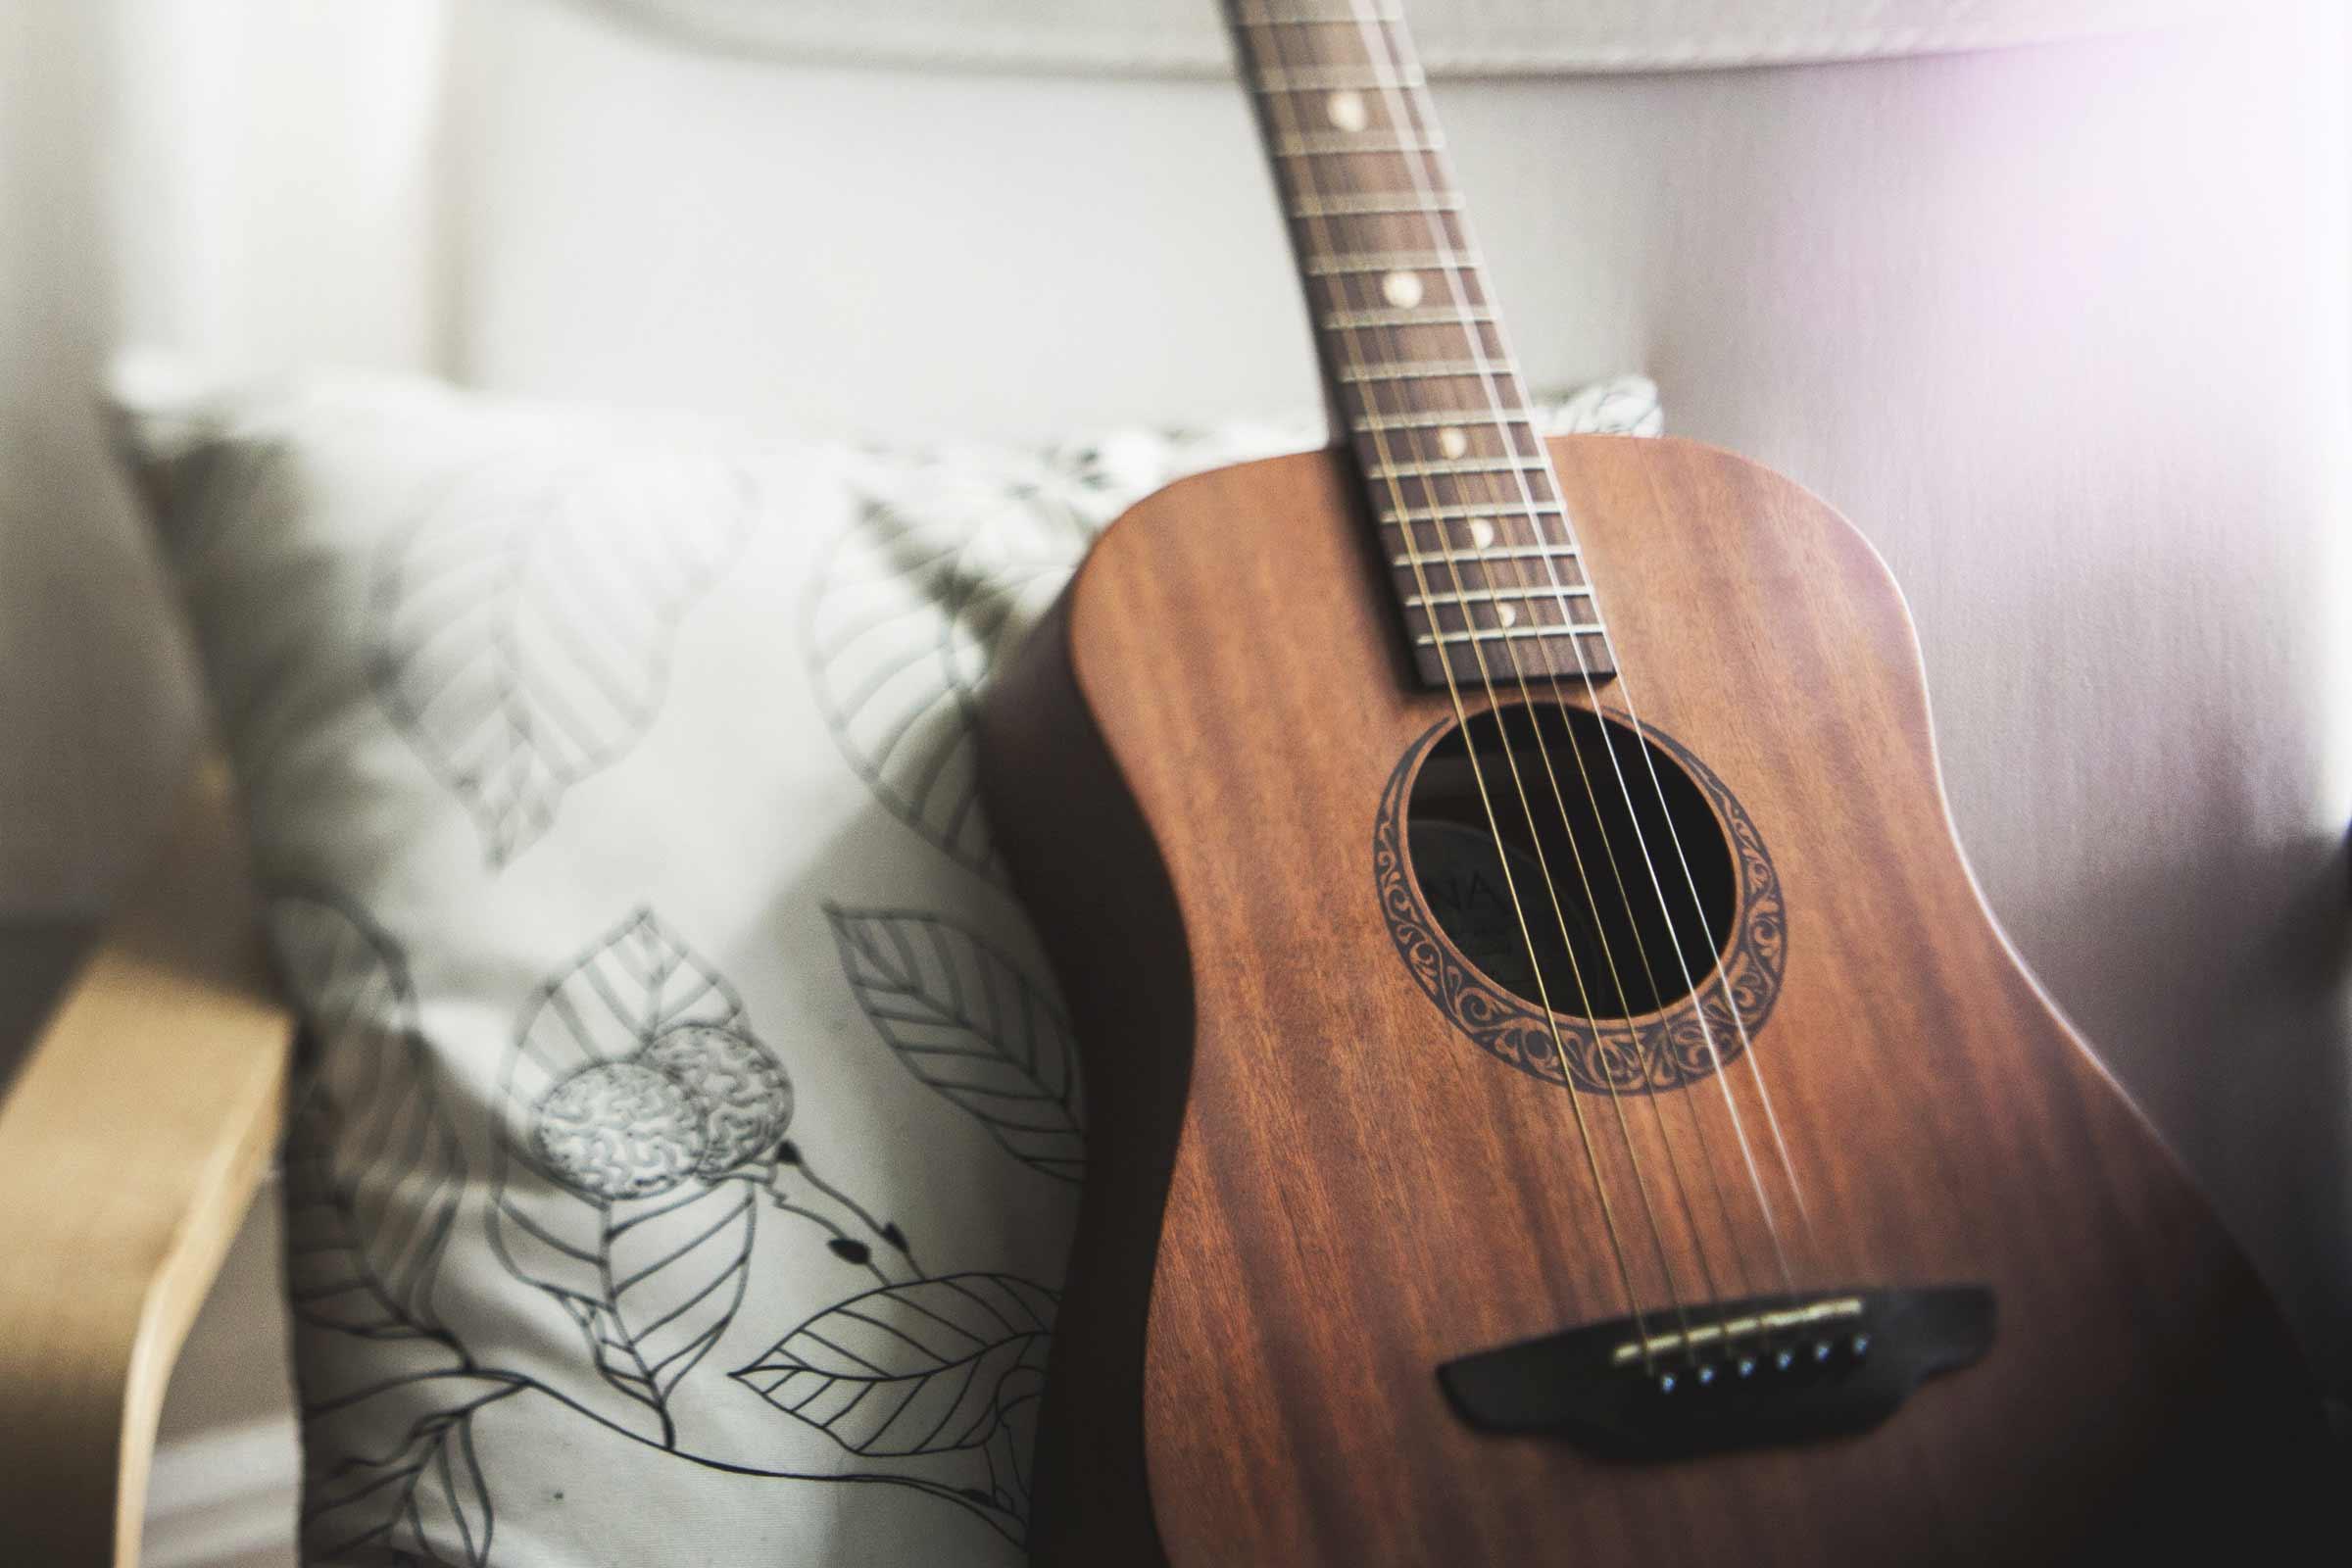 Playing Six String Guitar